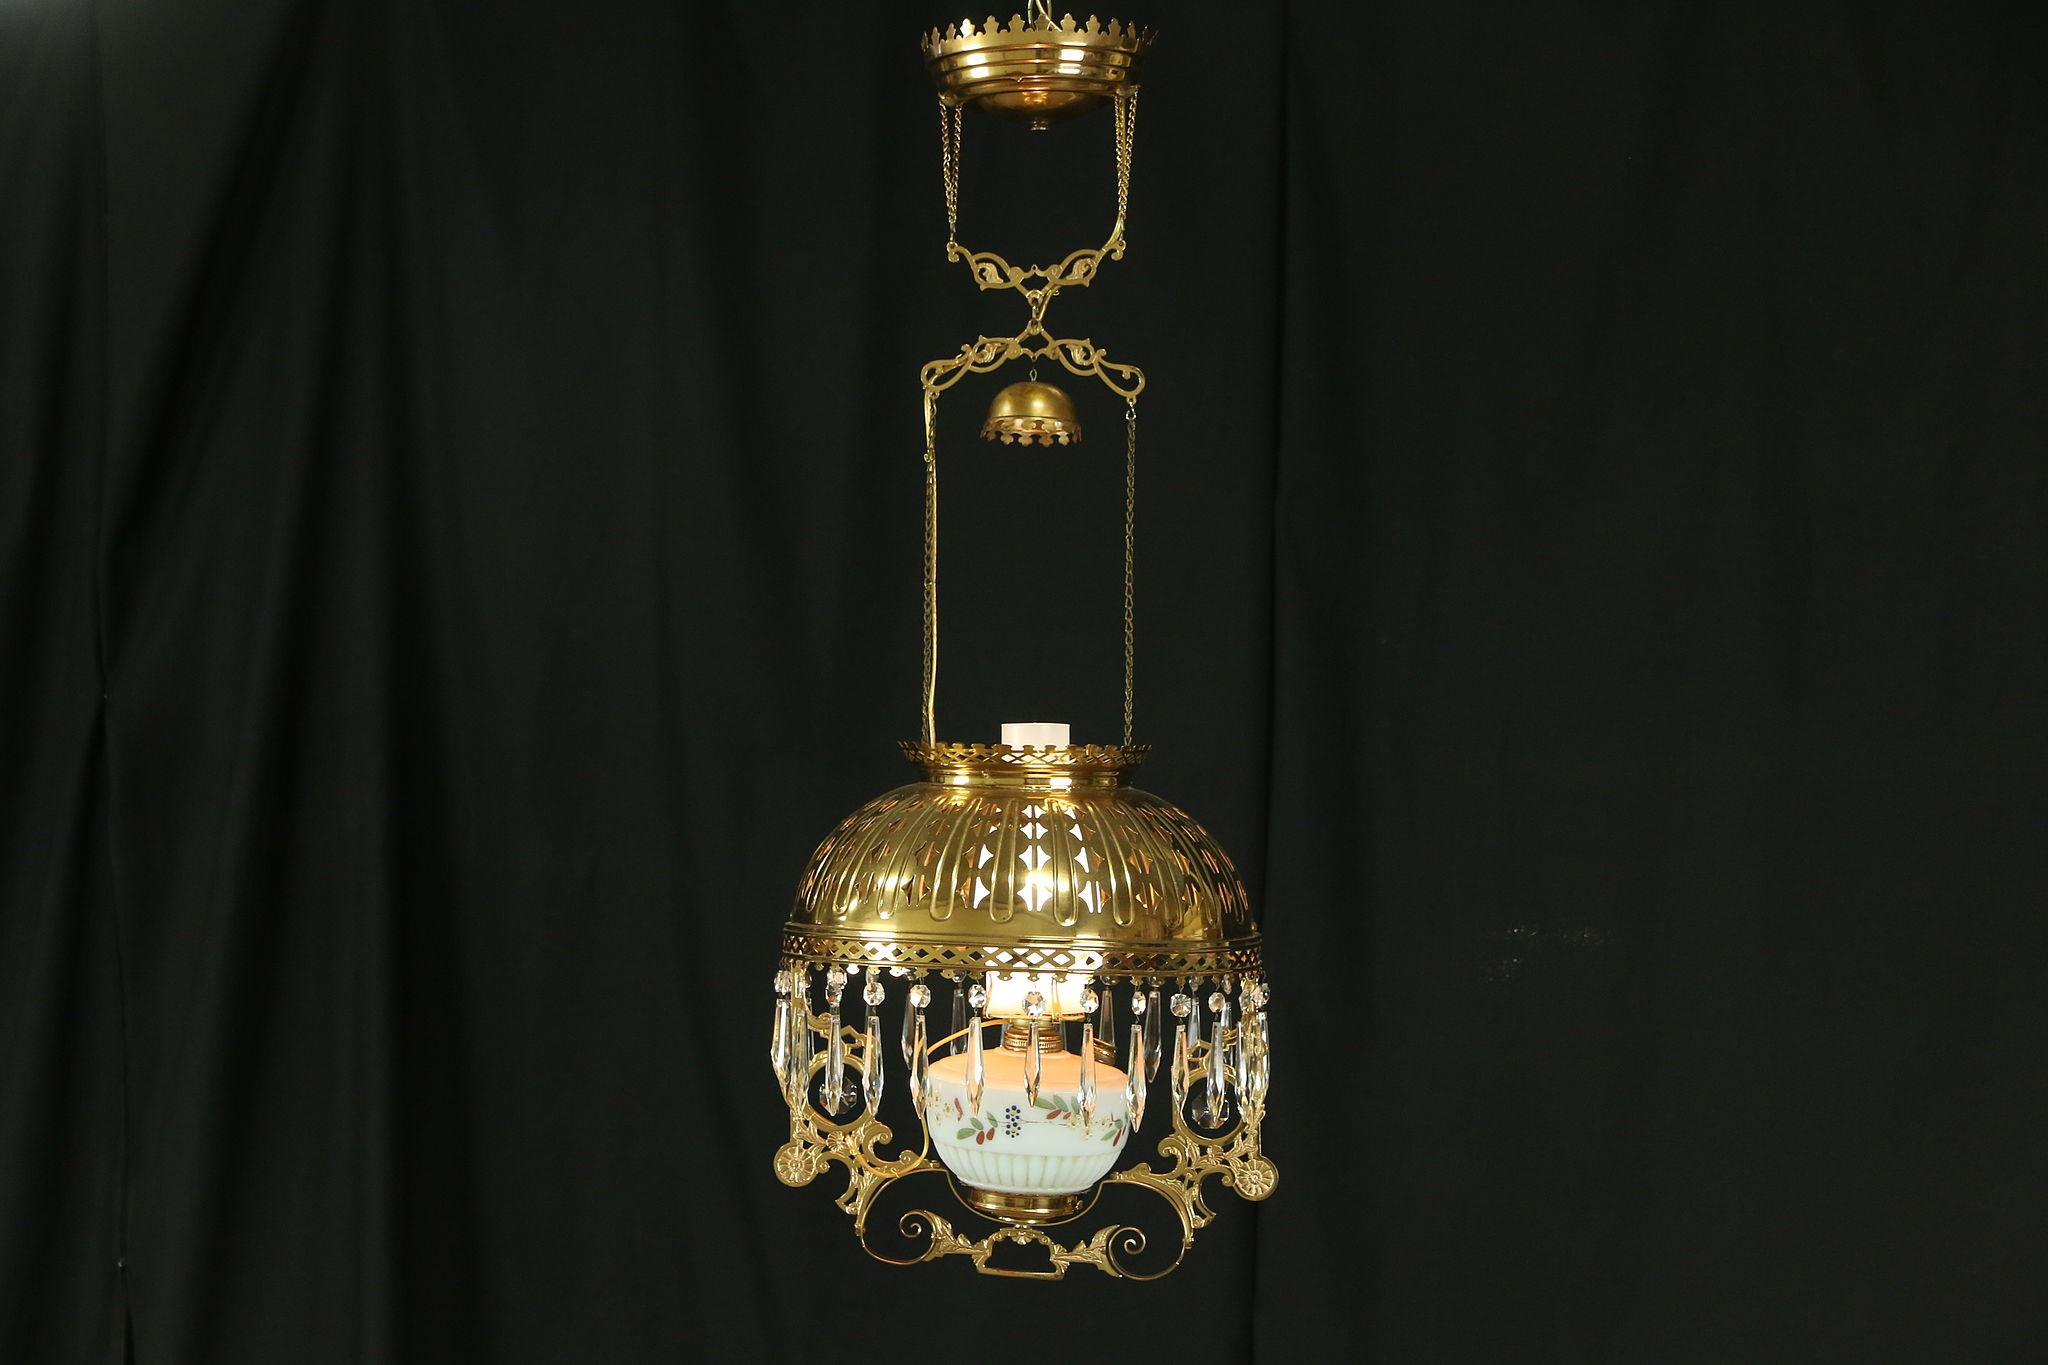 SOLD - Victorian 1880 Antique Hanging Lamp Brass Shade Light Fixture ...